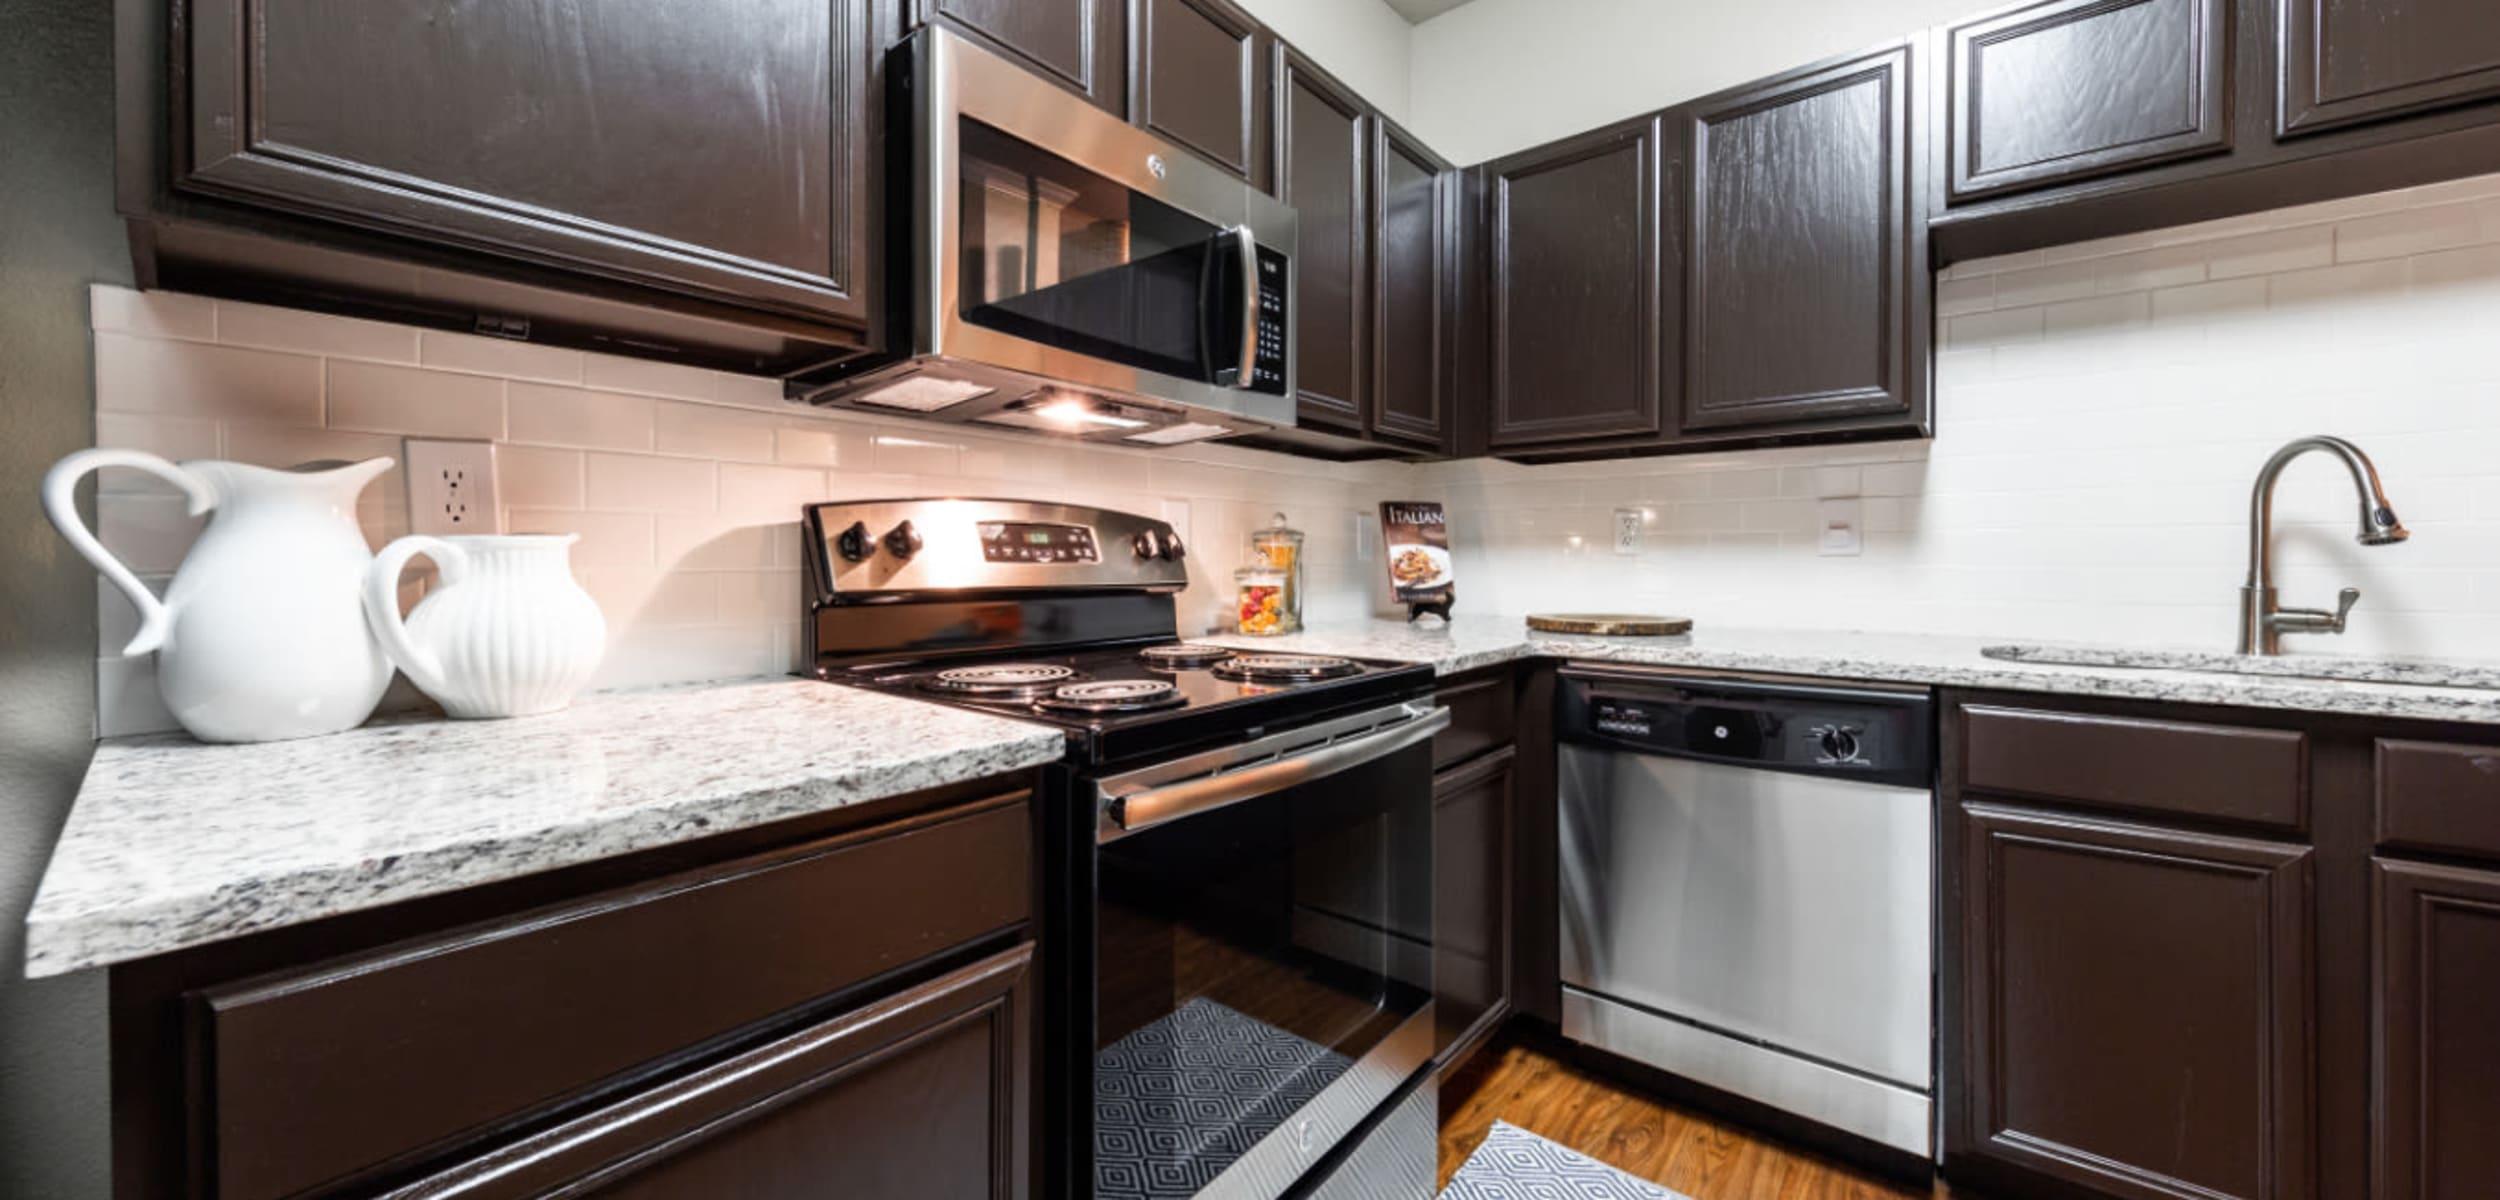 Kitchen space at Marquis at Ladera Vista in Austin, Texas